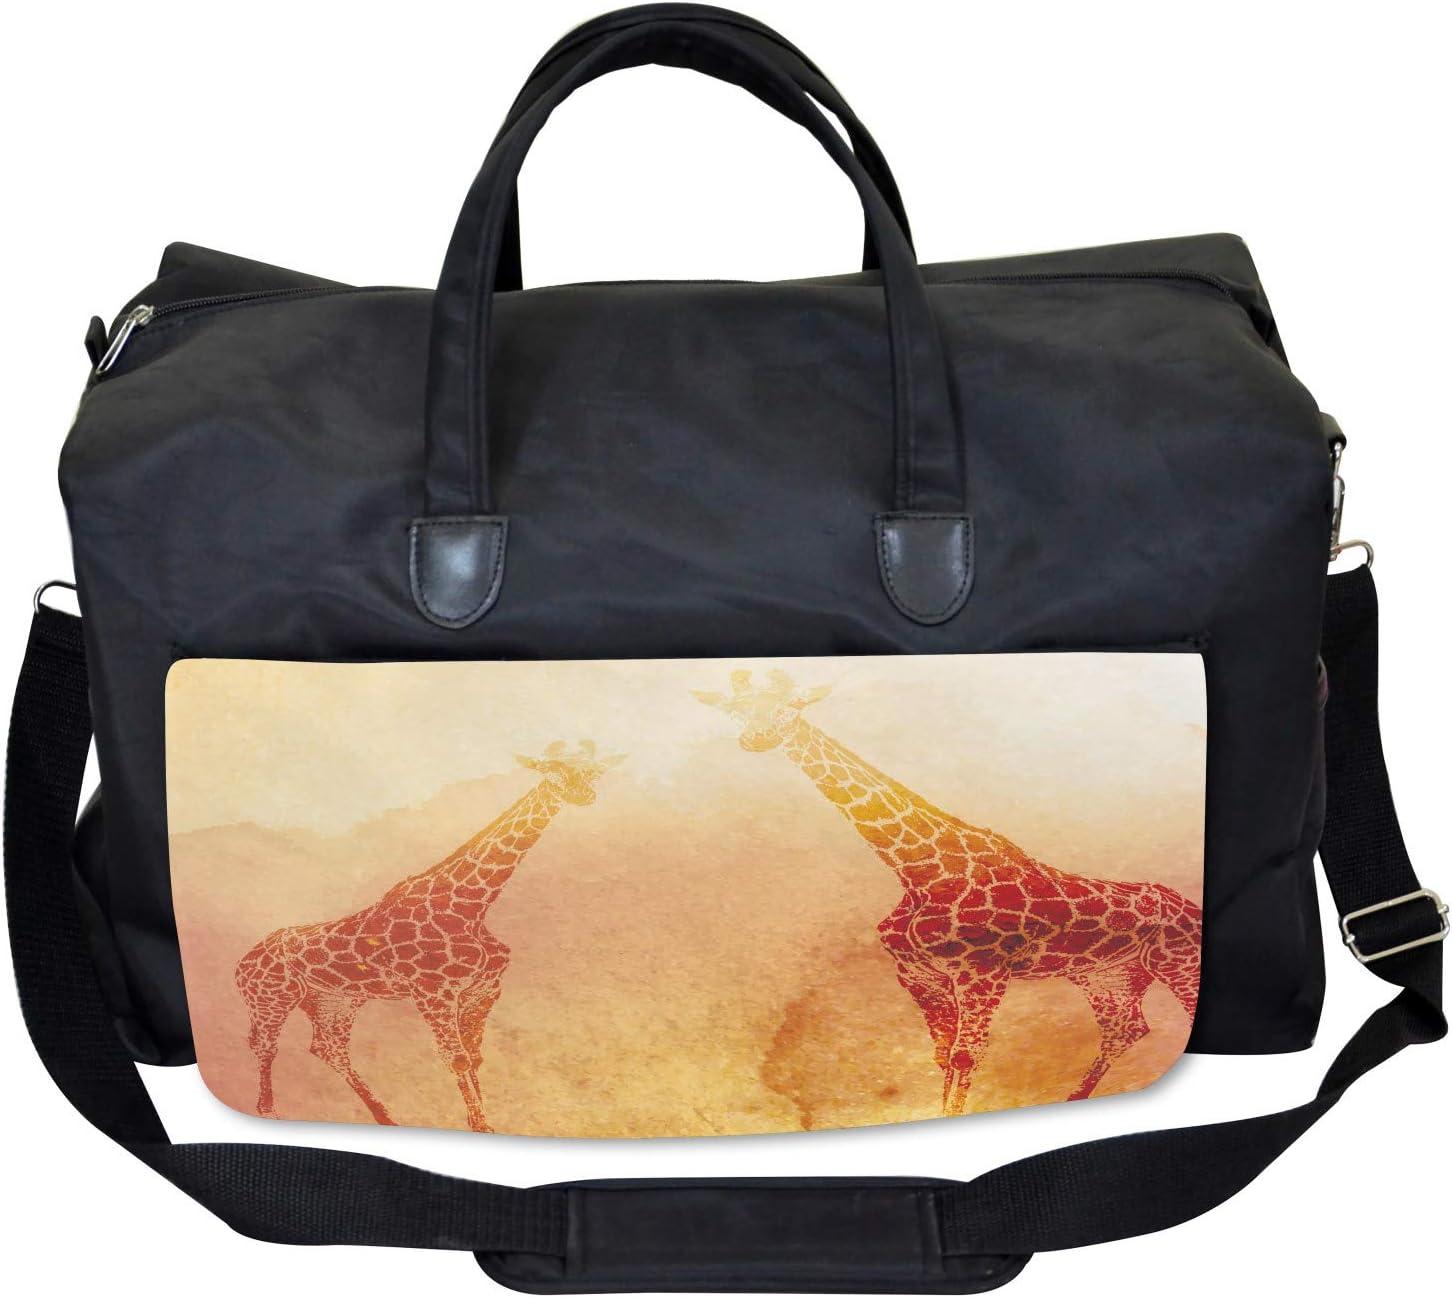 Ambesonne Orange Gym Bag Tropic African Giraffes Large Weekender Carry-on